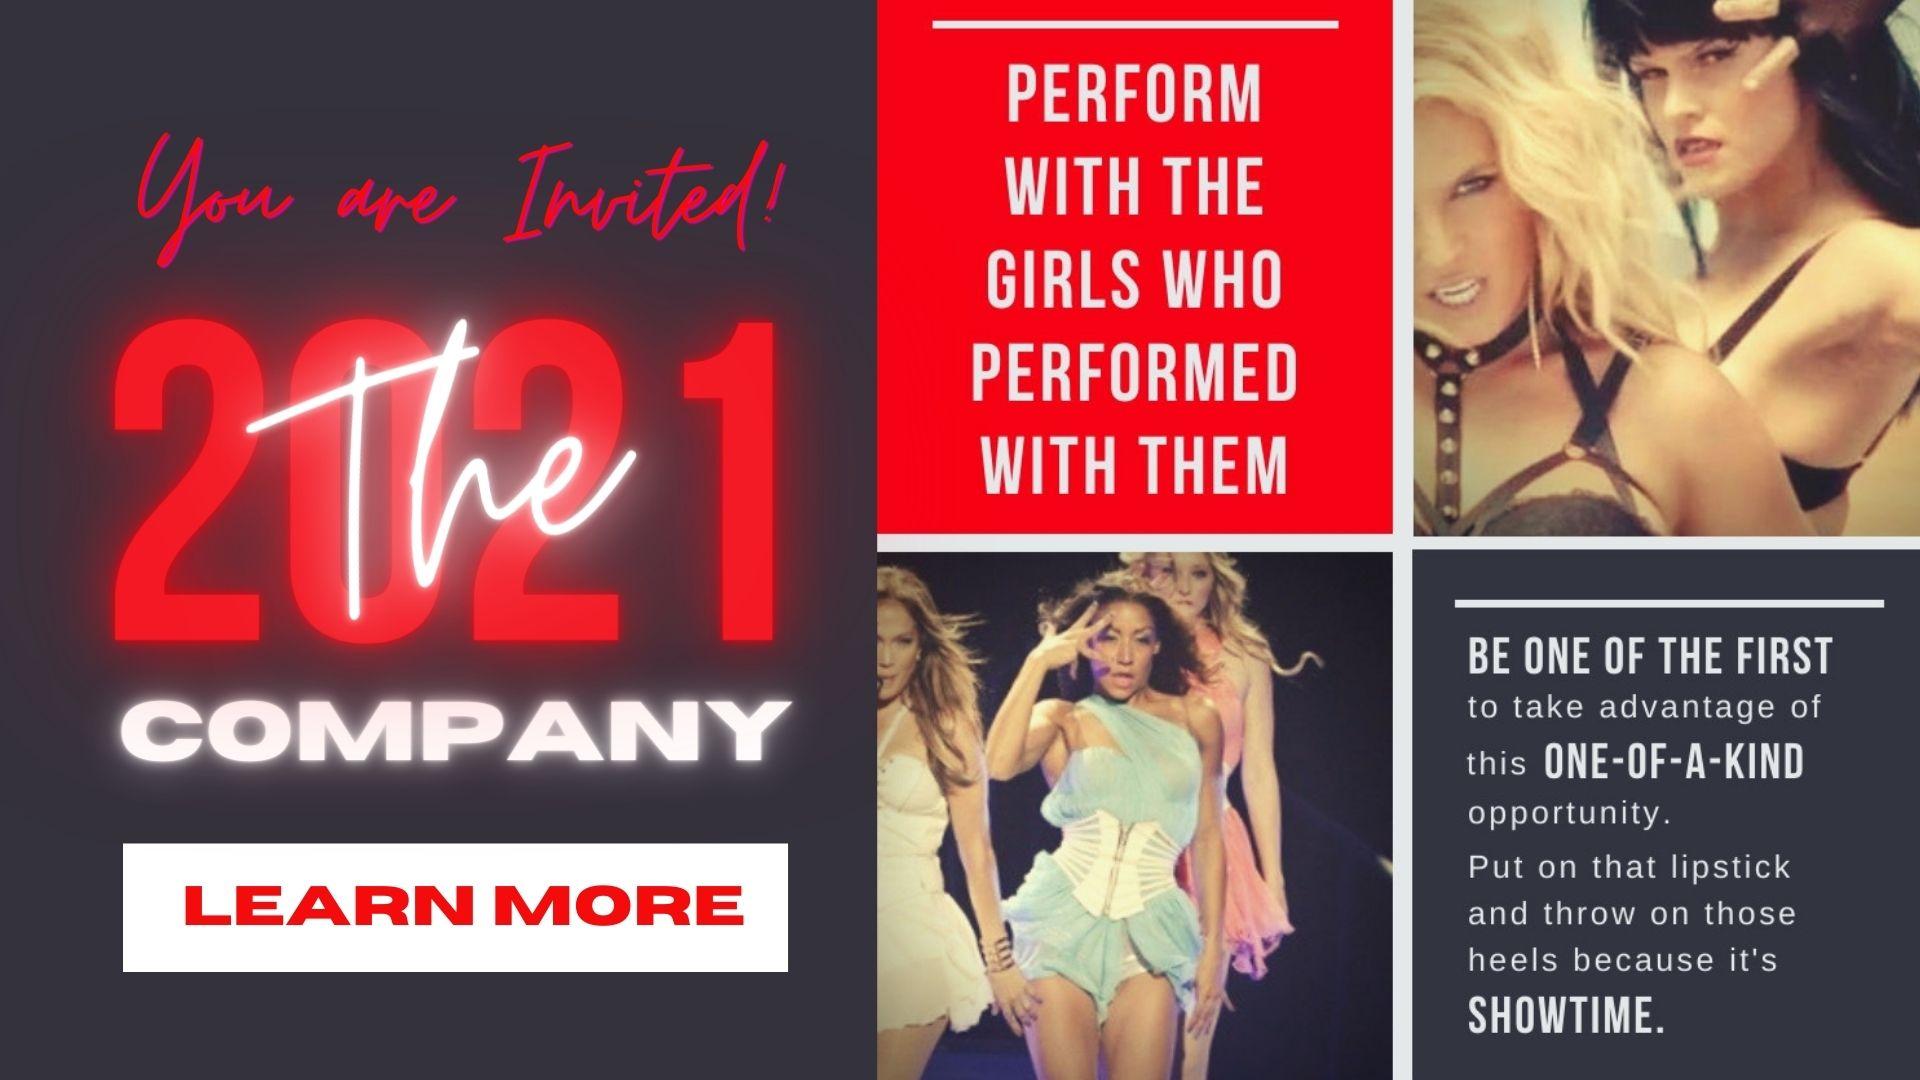 the 3xt dance company